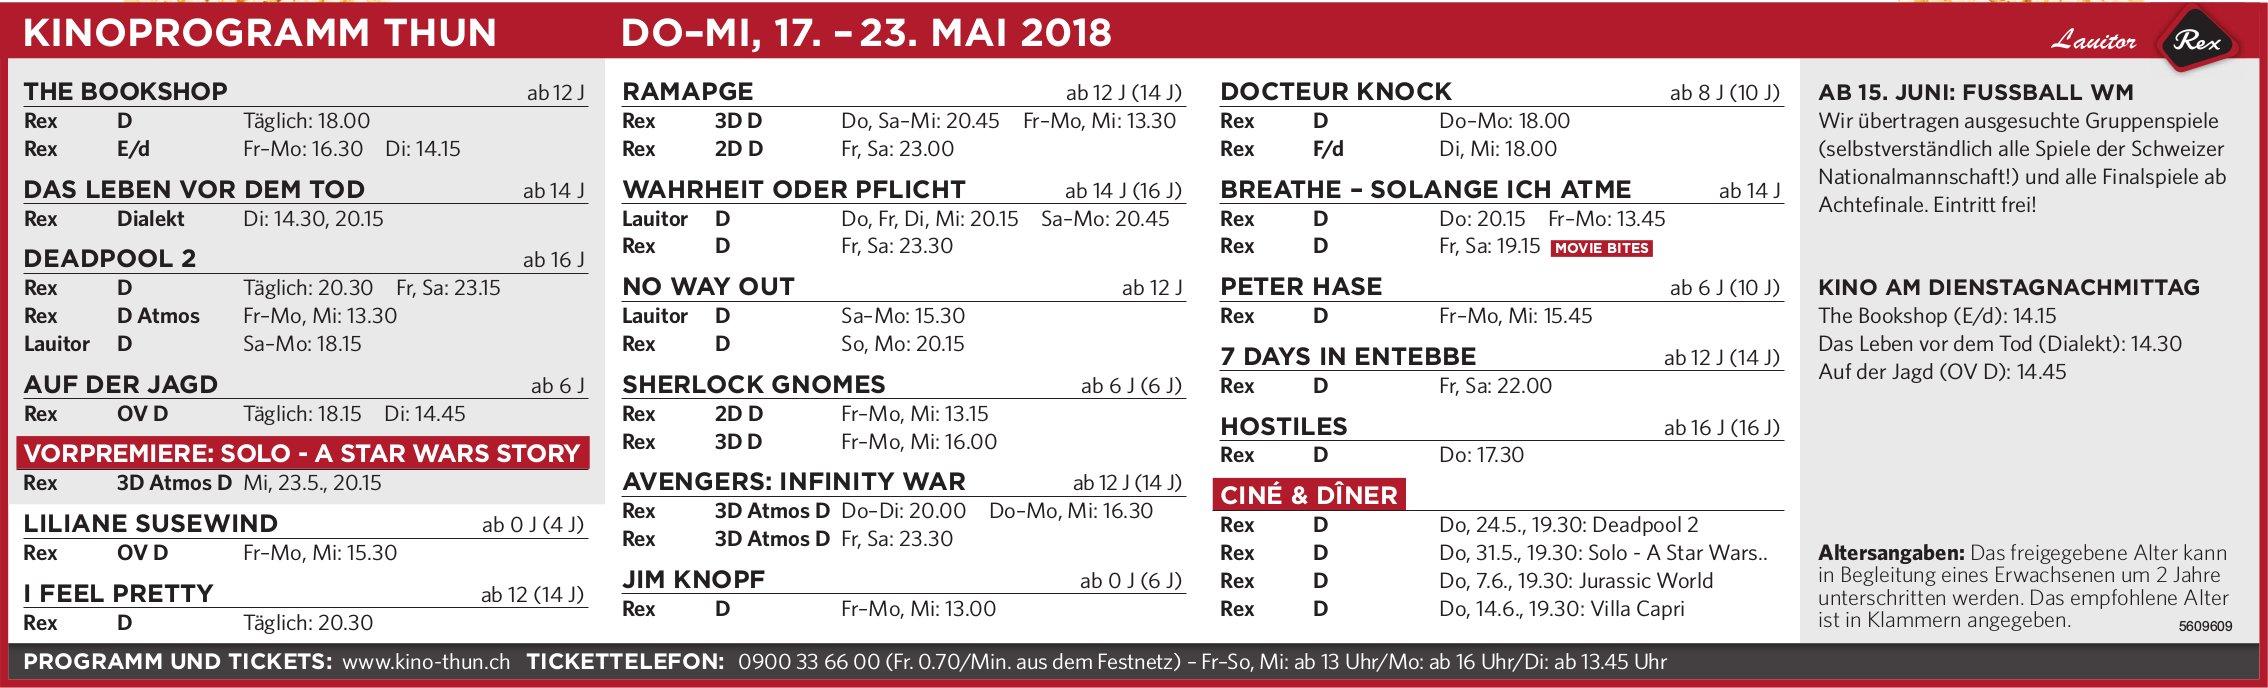 Kinoprogramm Thun, 17. - 23. Mai